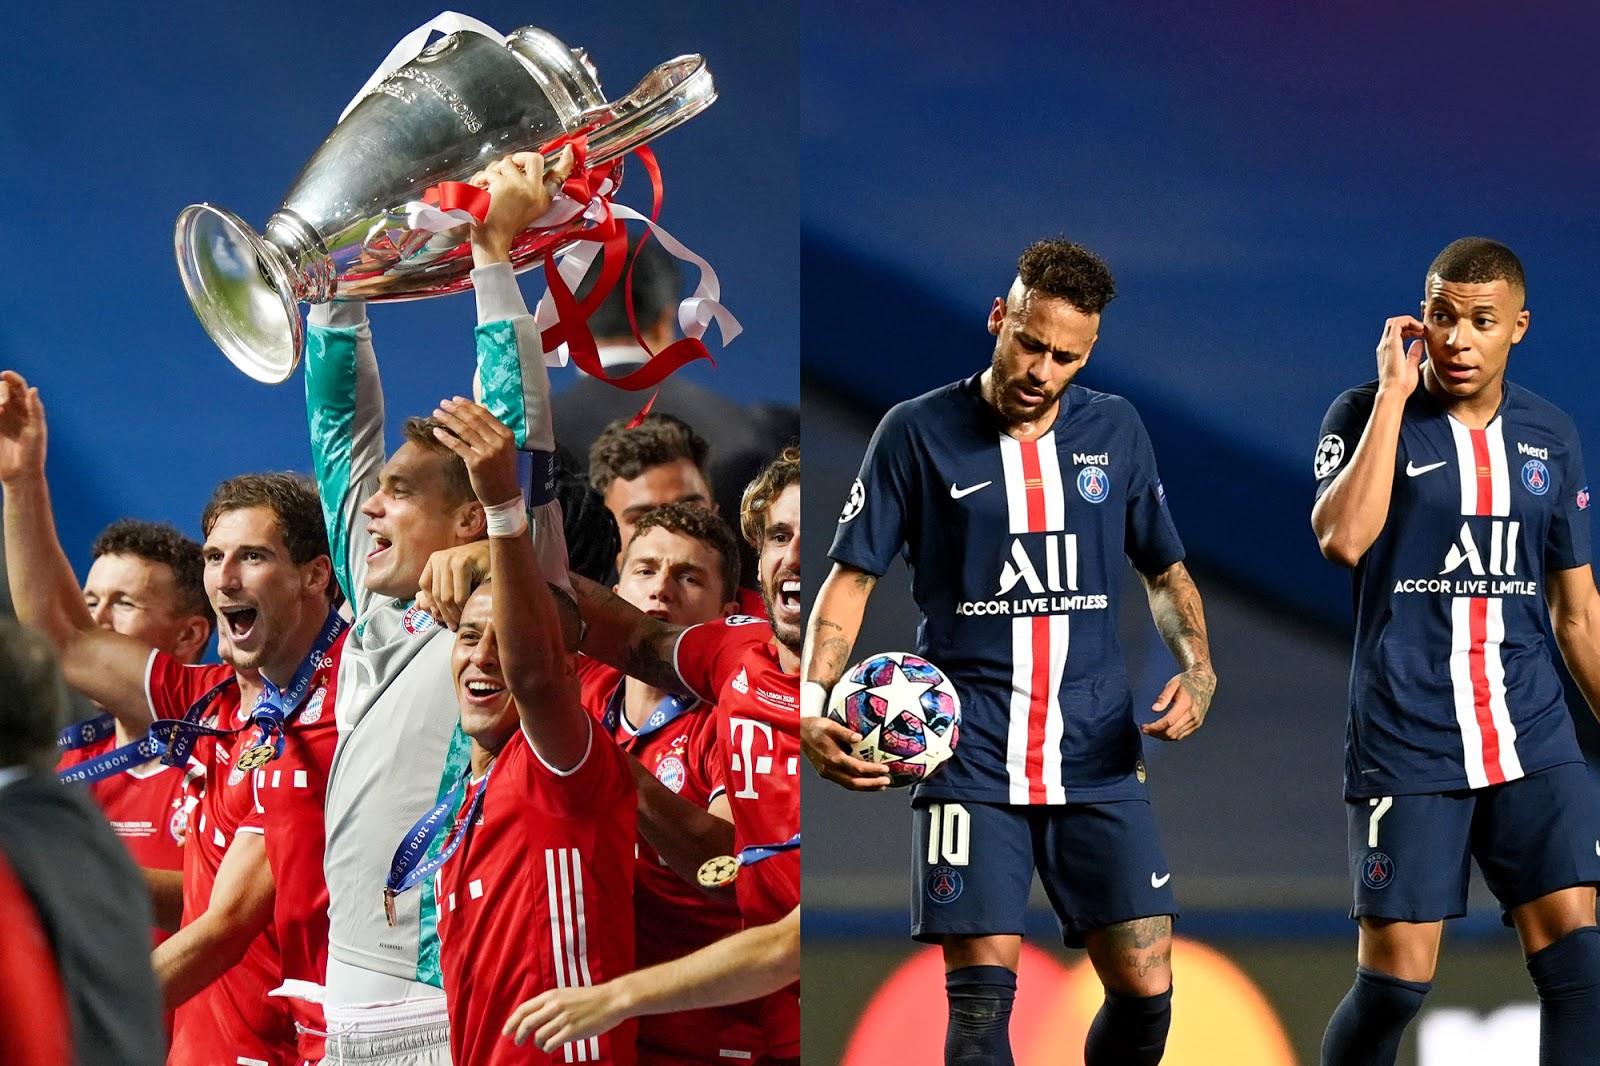 geld champions league